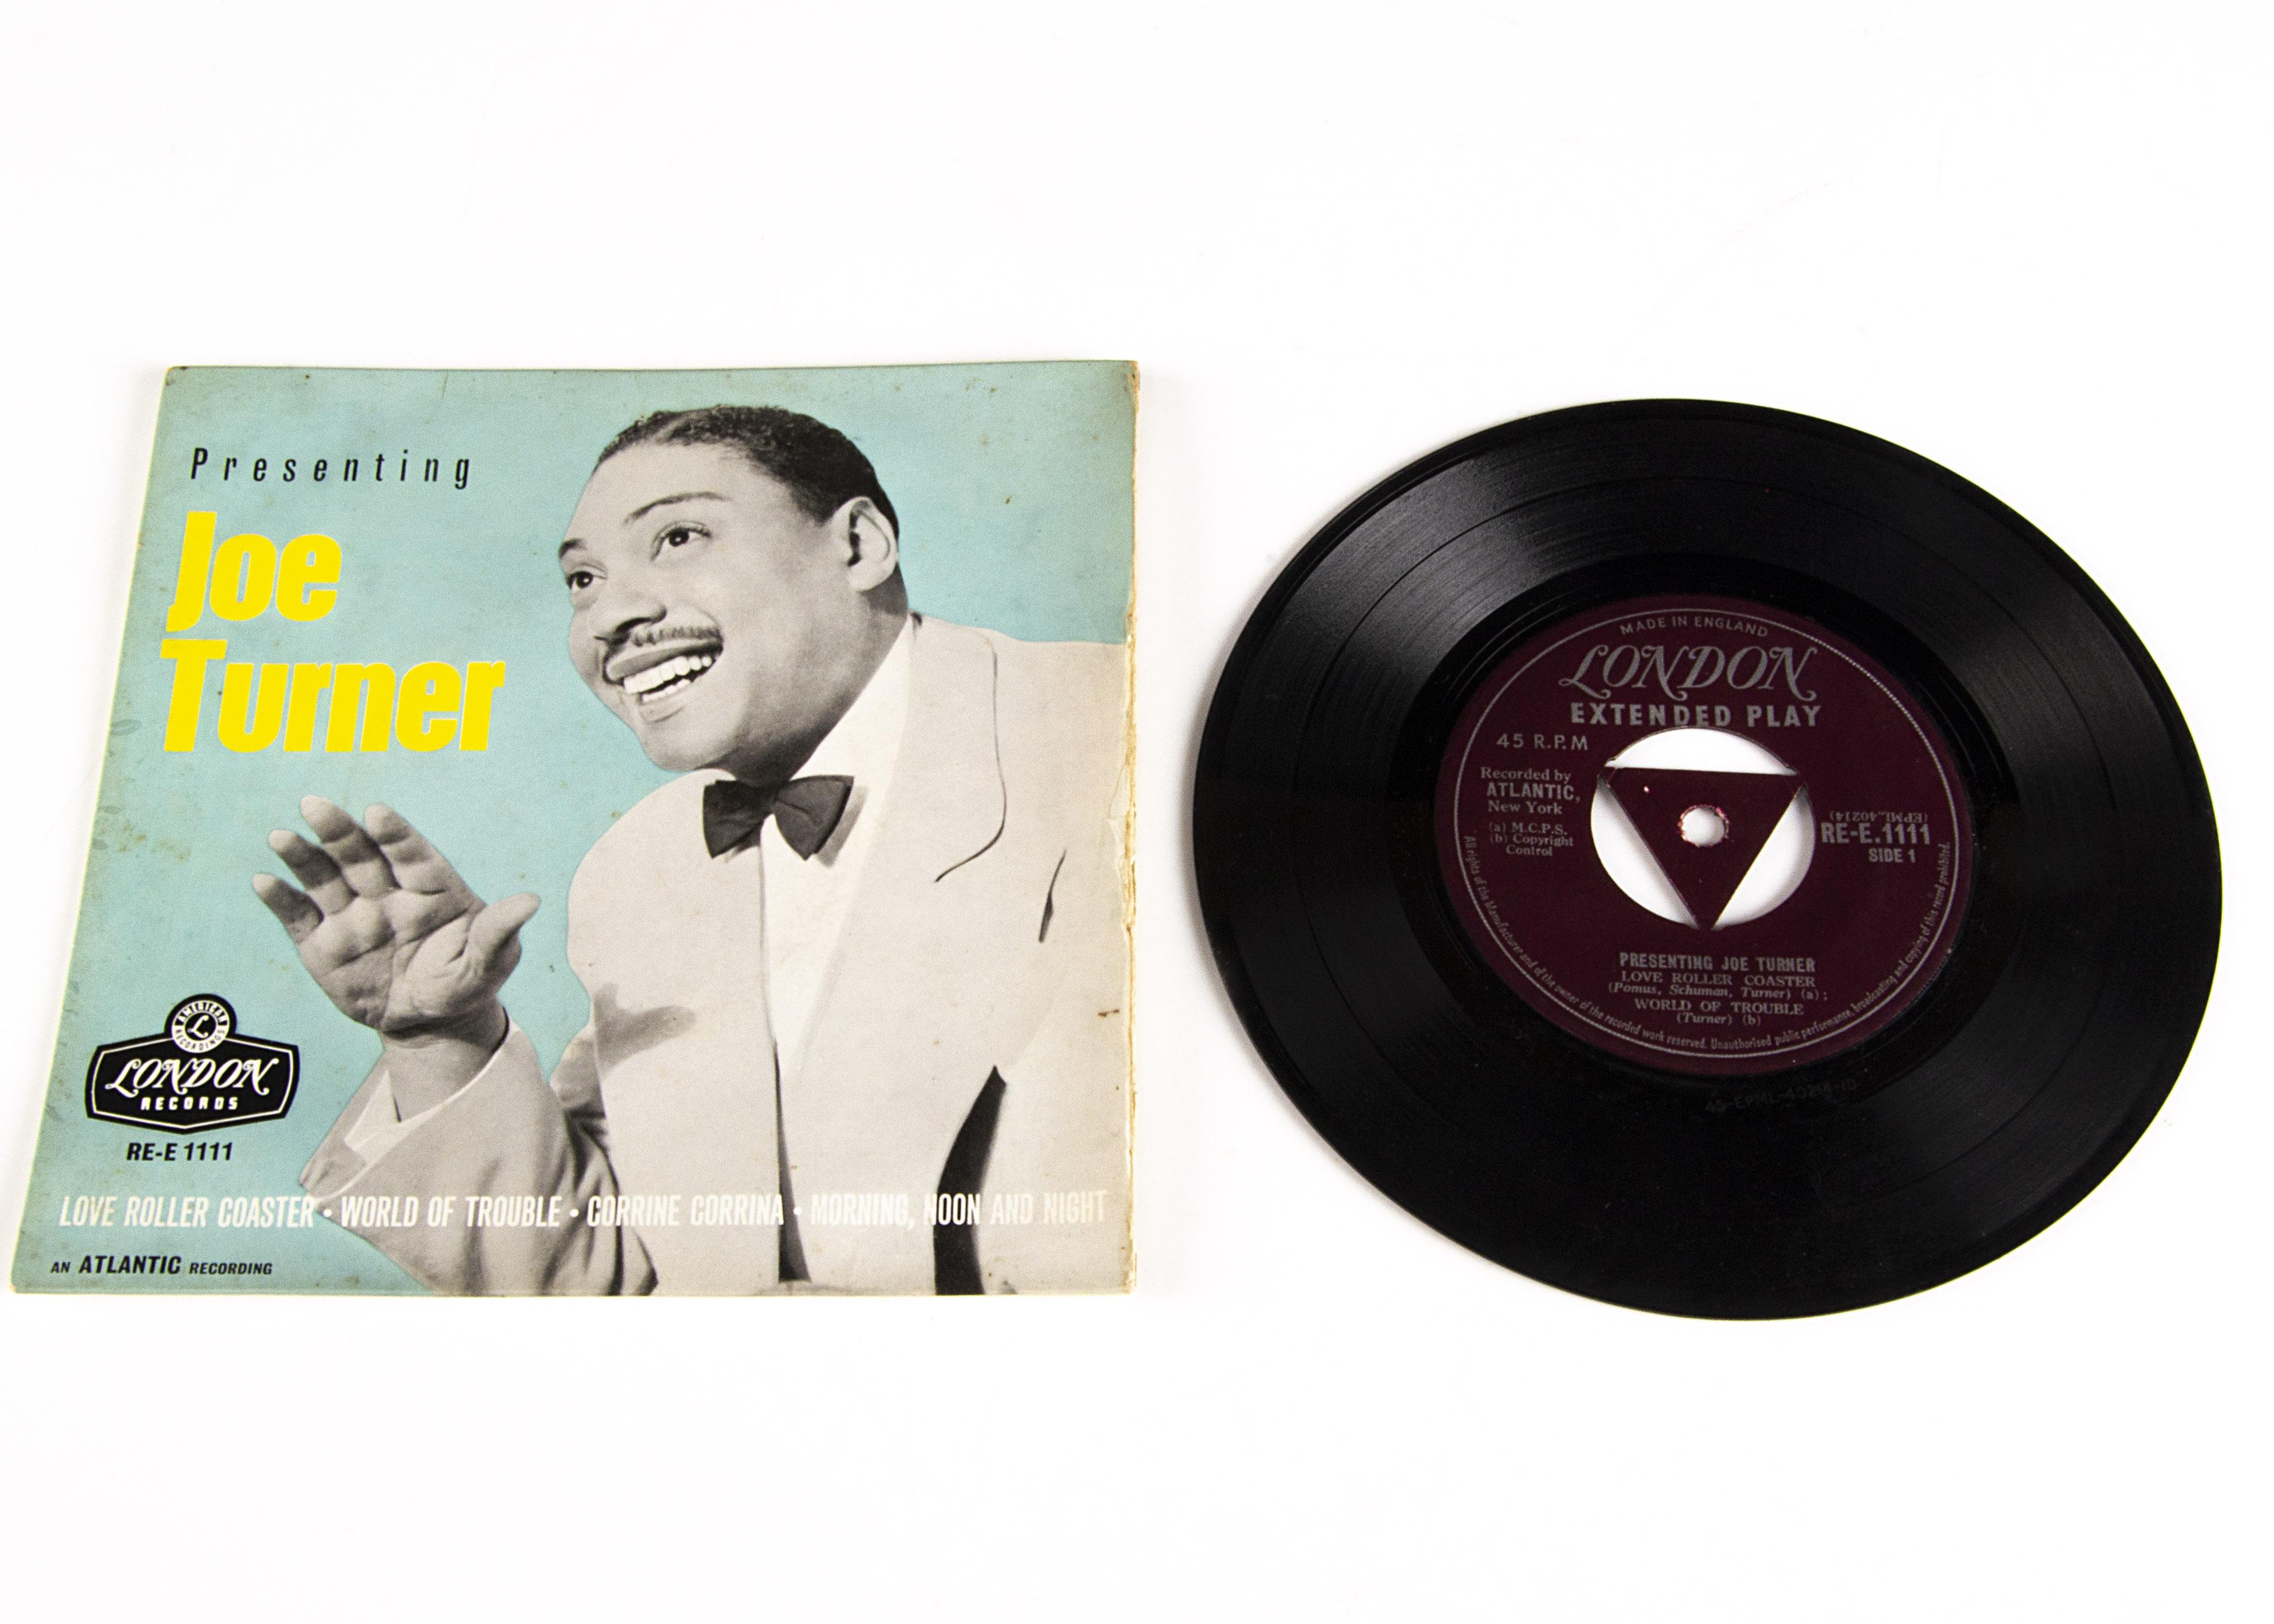 Joe Turner EP, Presenting Joe Turner EP - Original UK Release 1957 on London (Re-E 1111) - Laminated